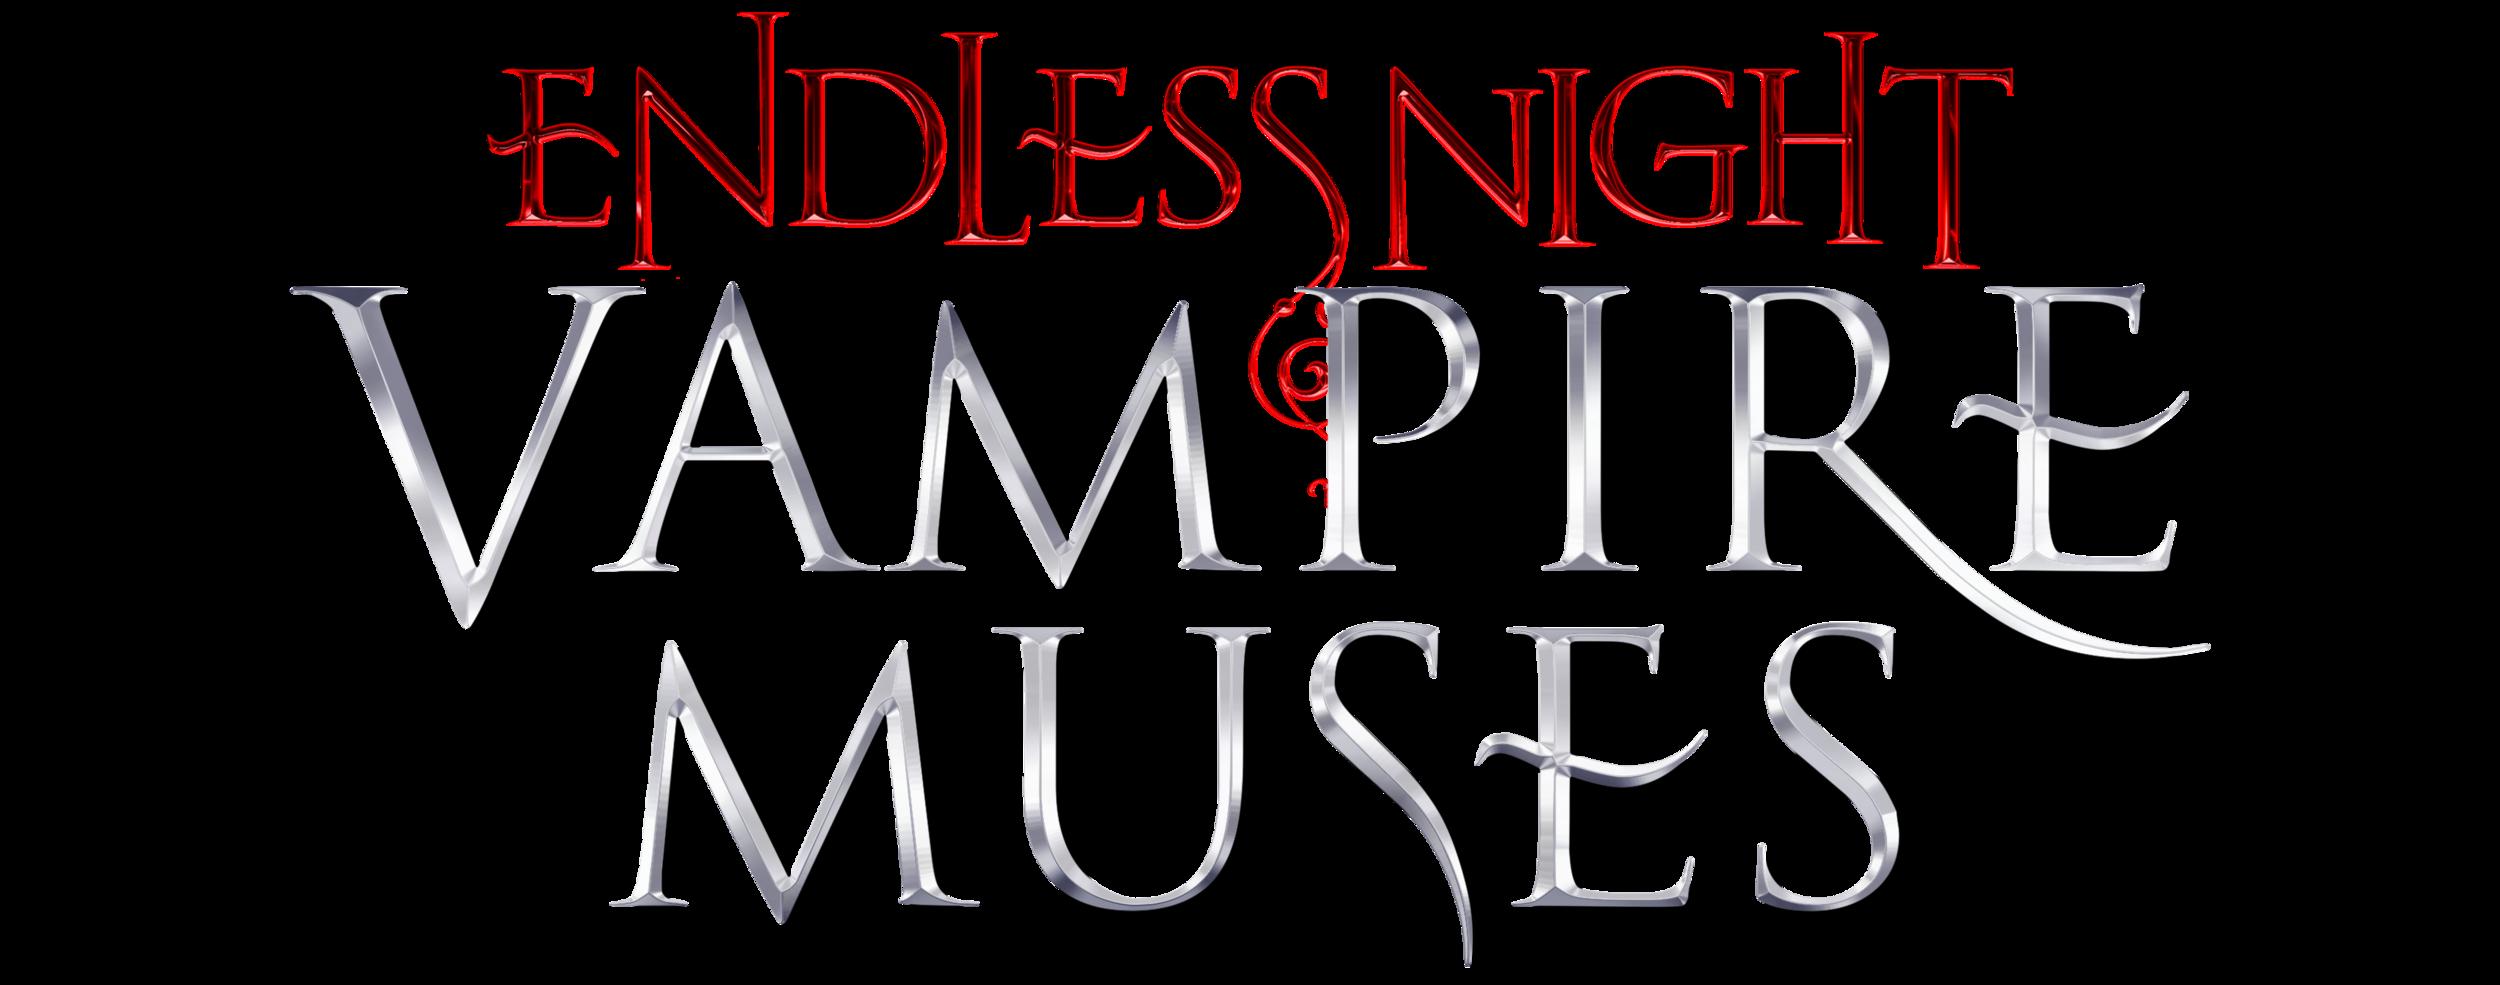 Endless Night Vampire Muses Logo.png